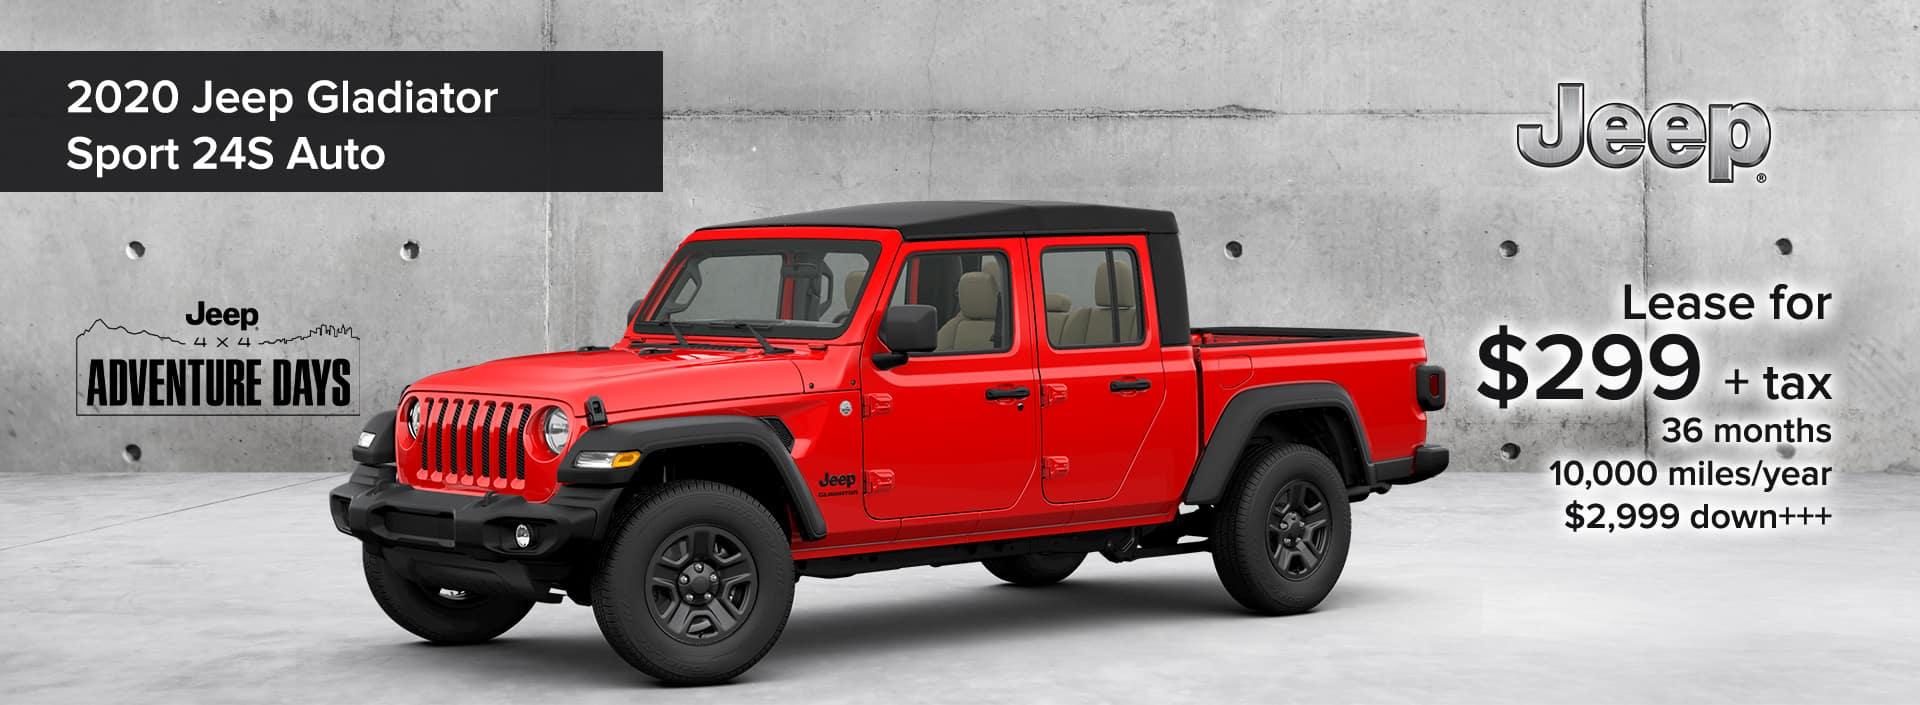 2020 Jeep Gladiator Sport 24S Auto Jeep 4x4 Adventure Days Lease Deal